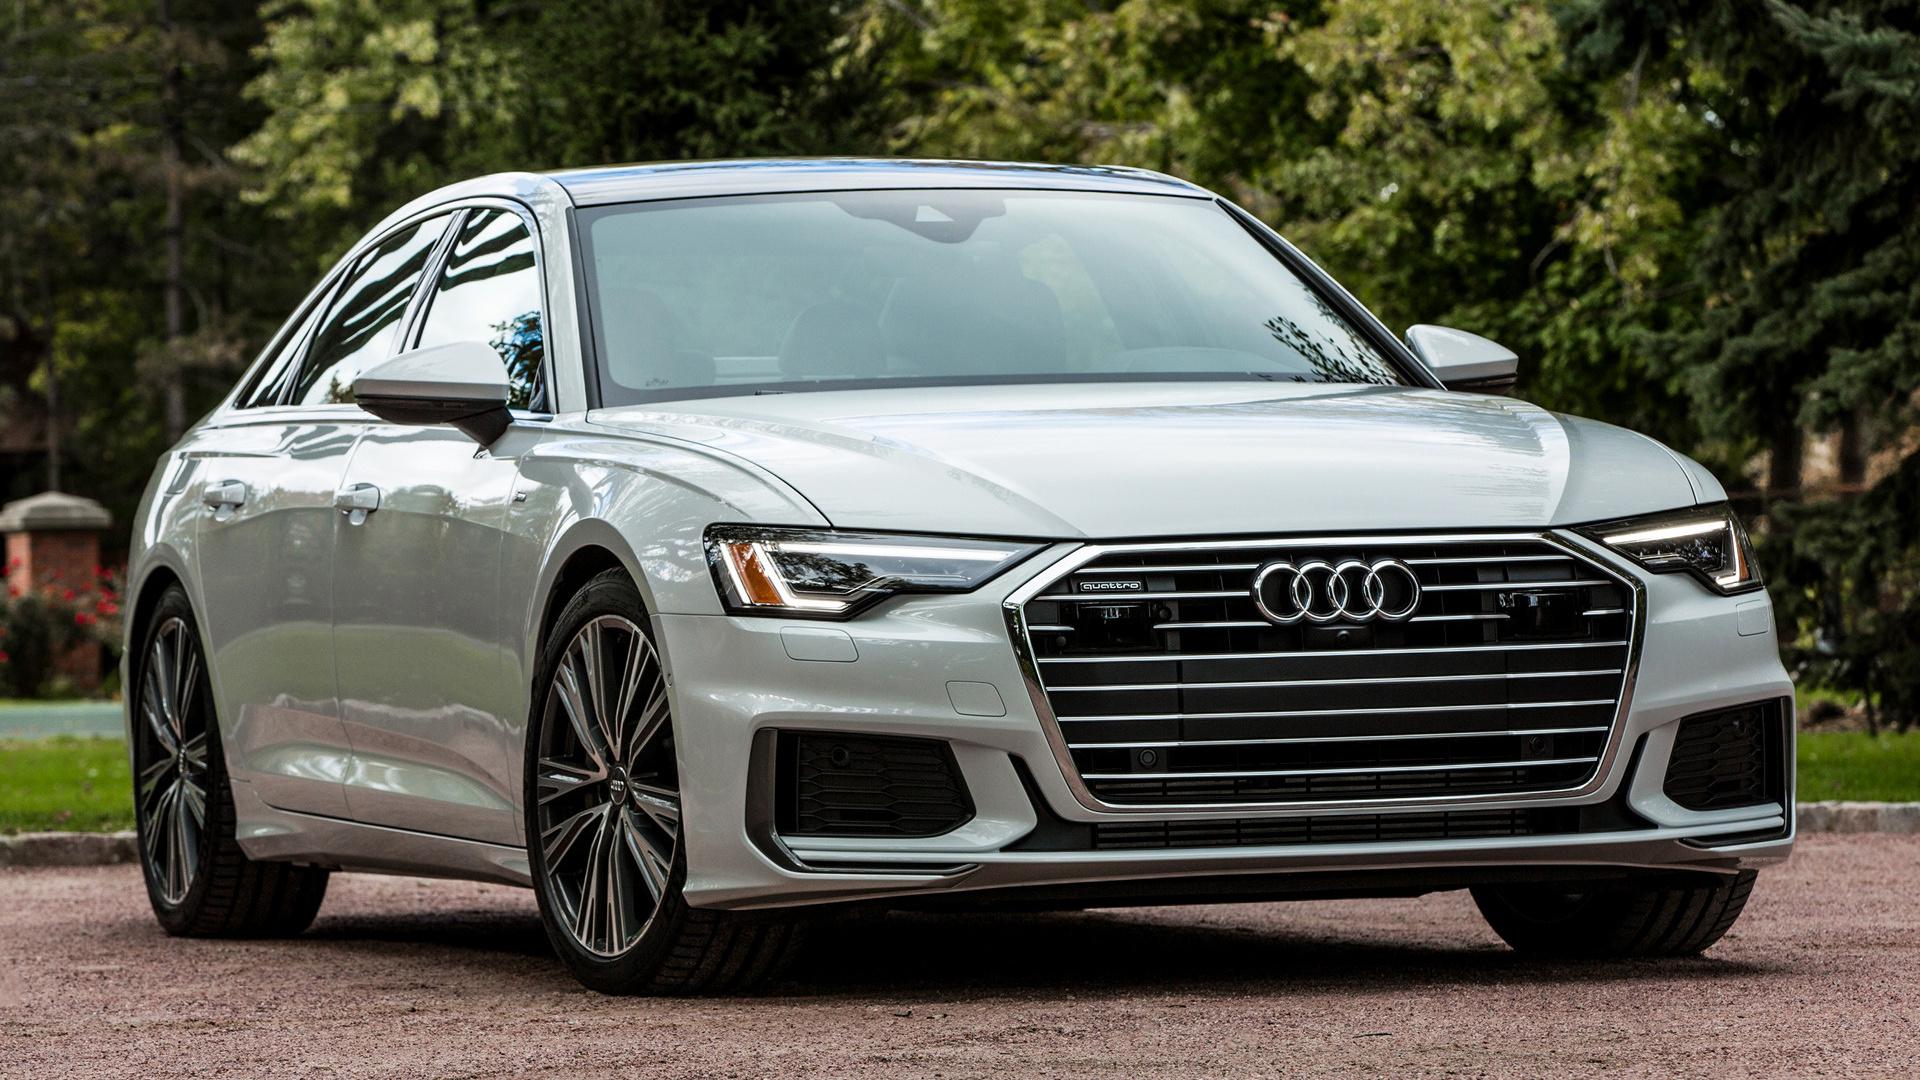 2019 Audi A6 Sedan S Line Us Wallpapers And Hd Images Car Pixel